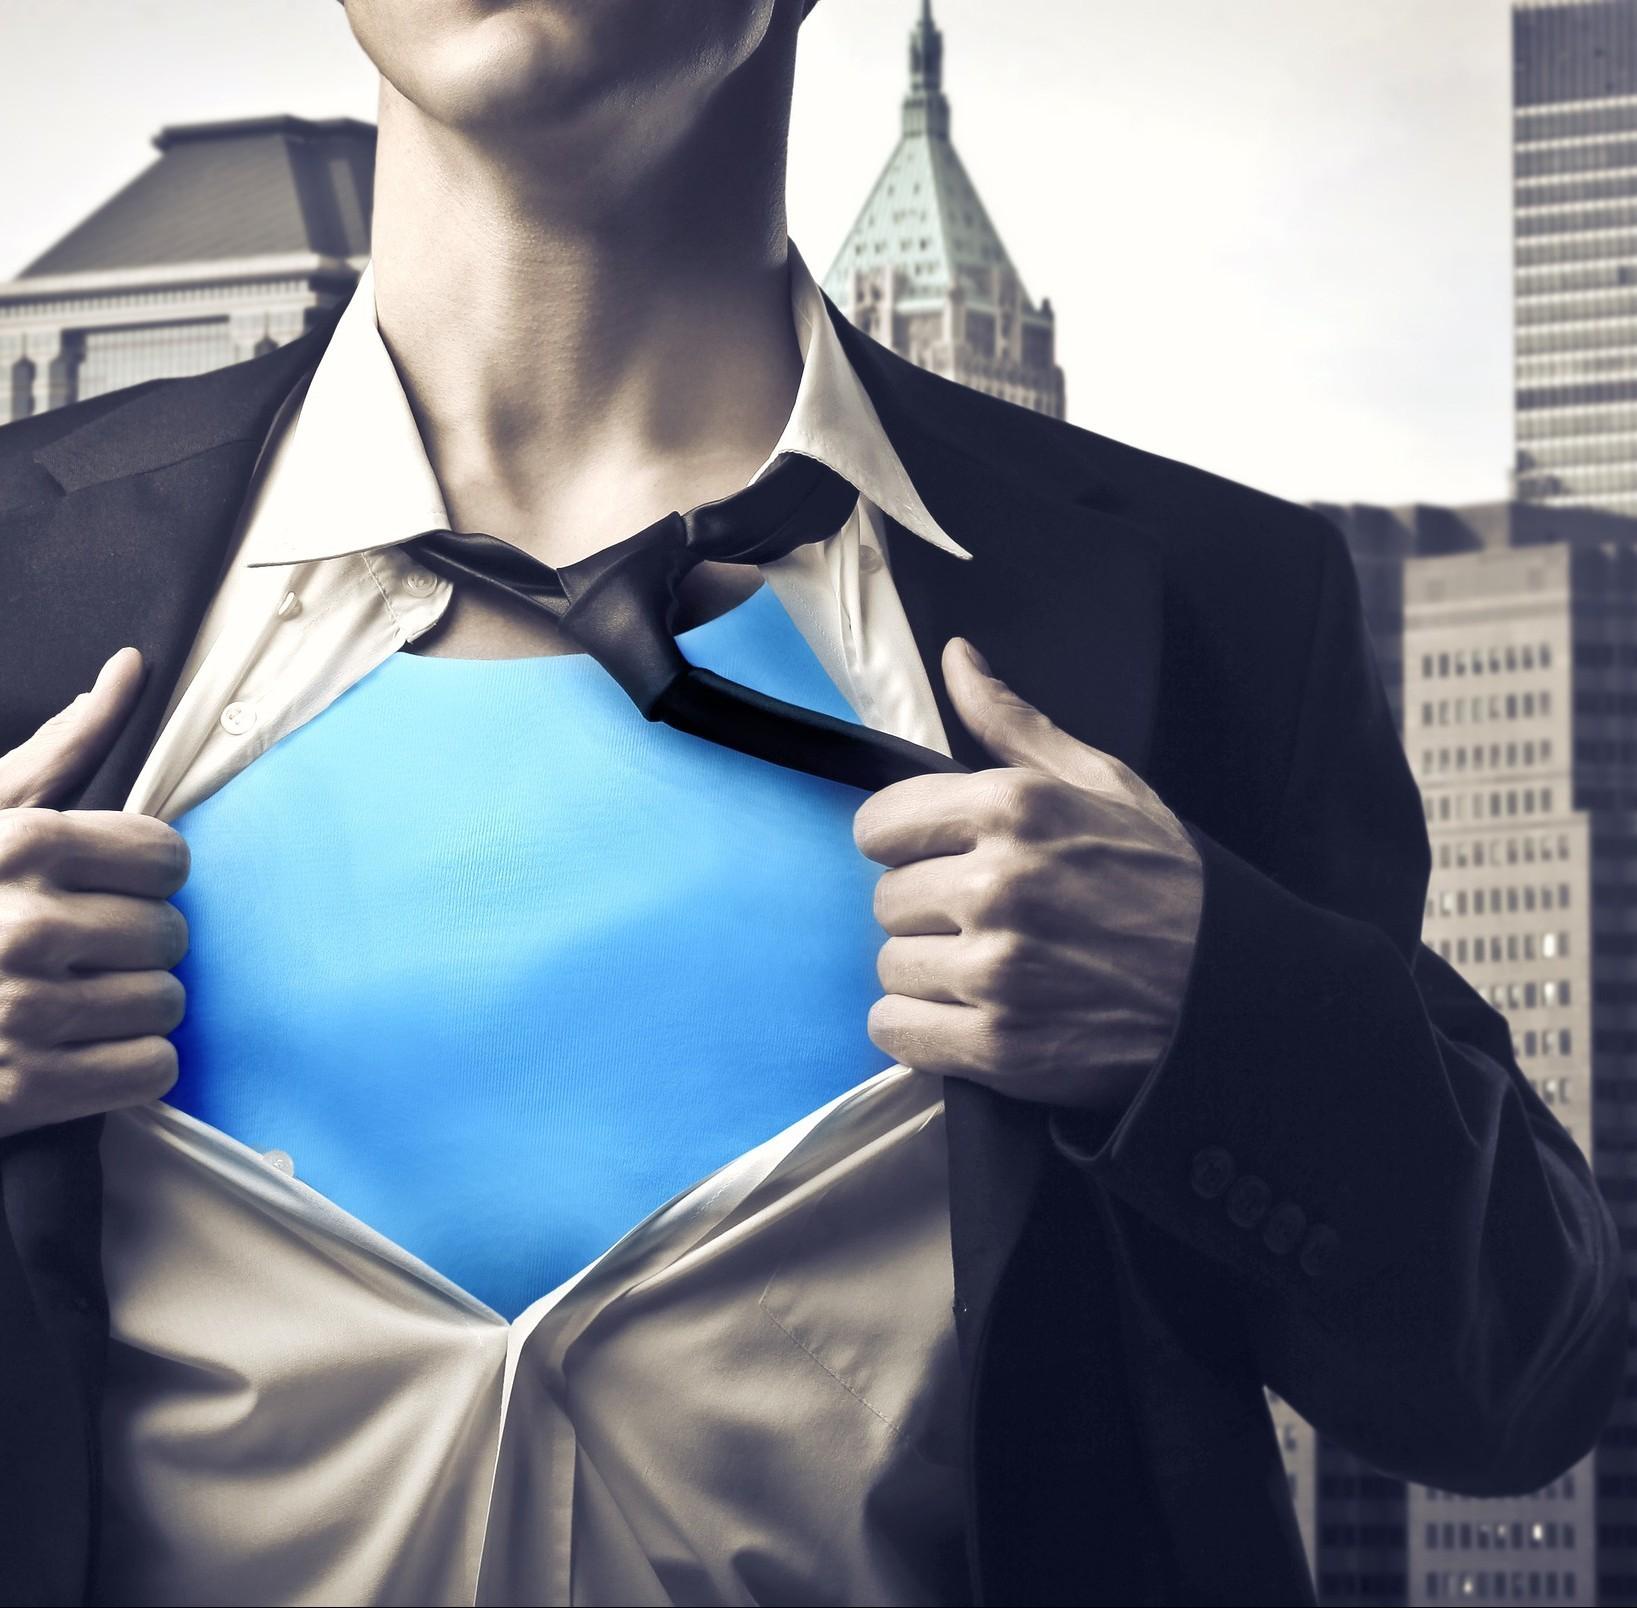 Closeup of a businessman showing the superhero suit under his sh